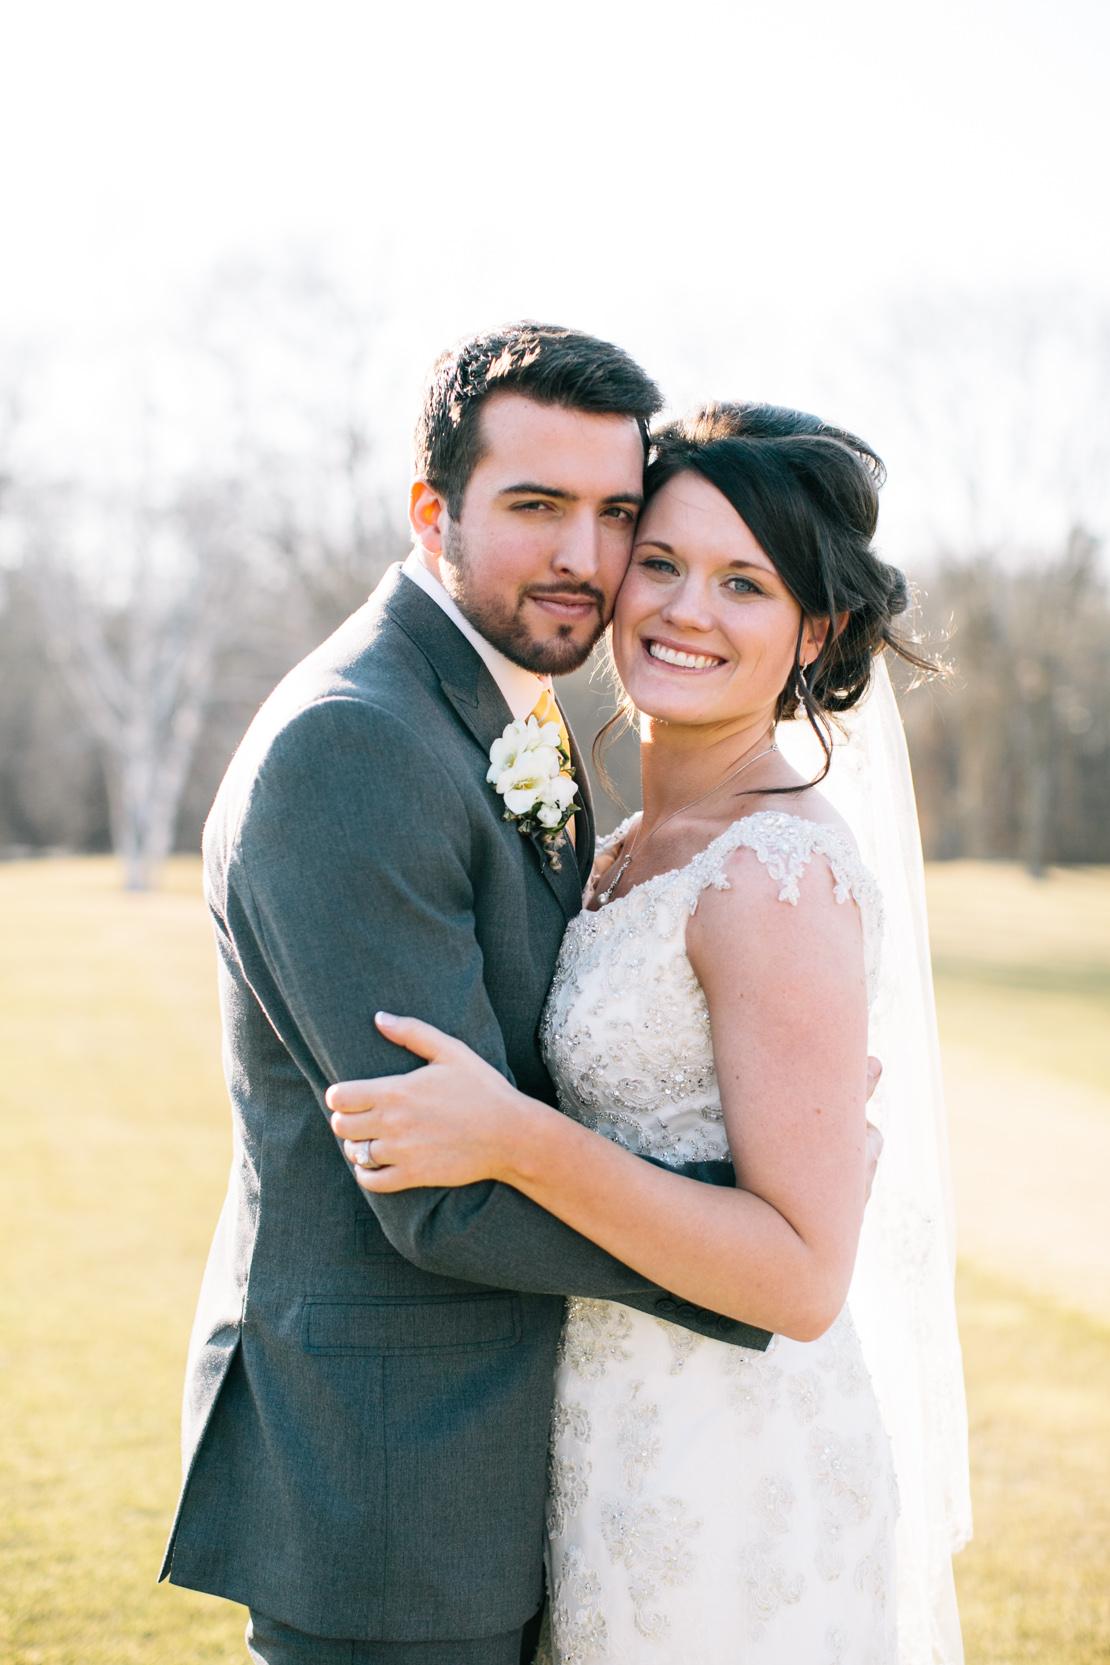 Steph-Thad-Wisconsin-Wedding_Grain-and-Compass-68.jpg